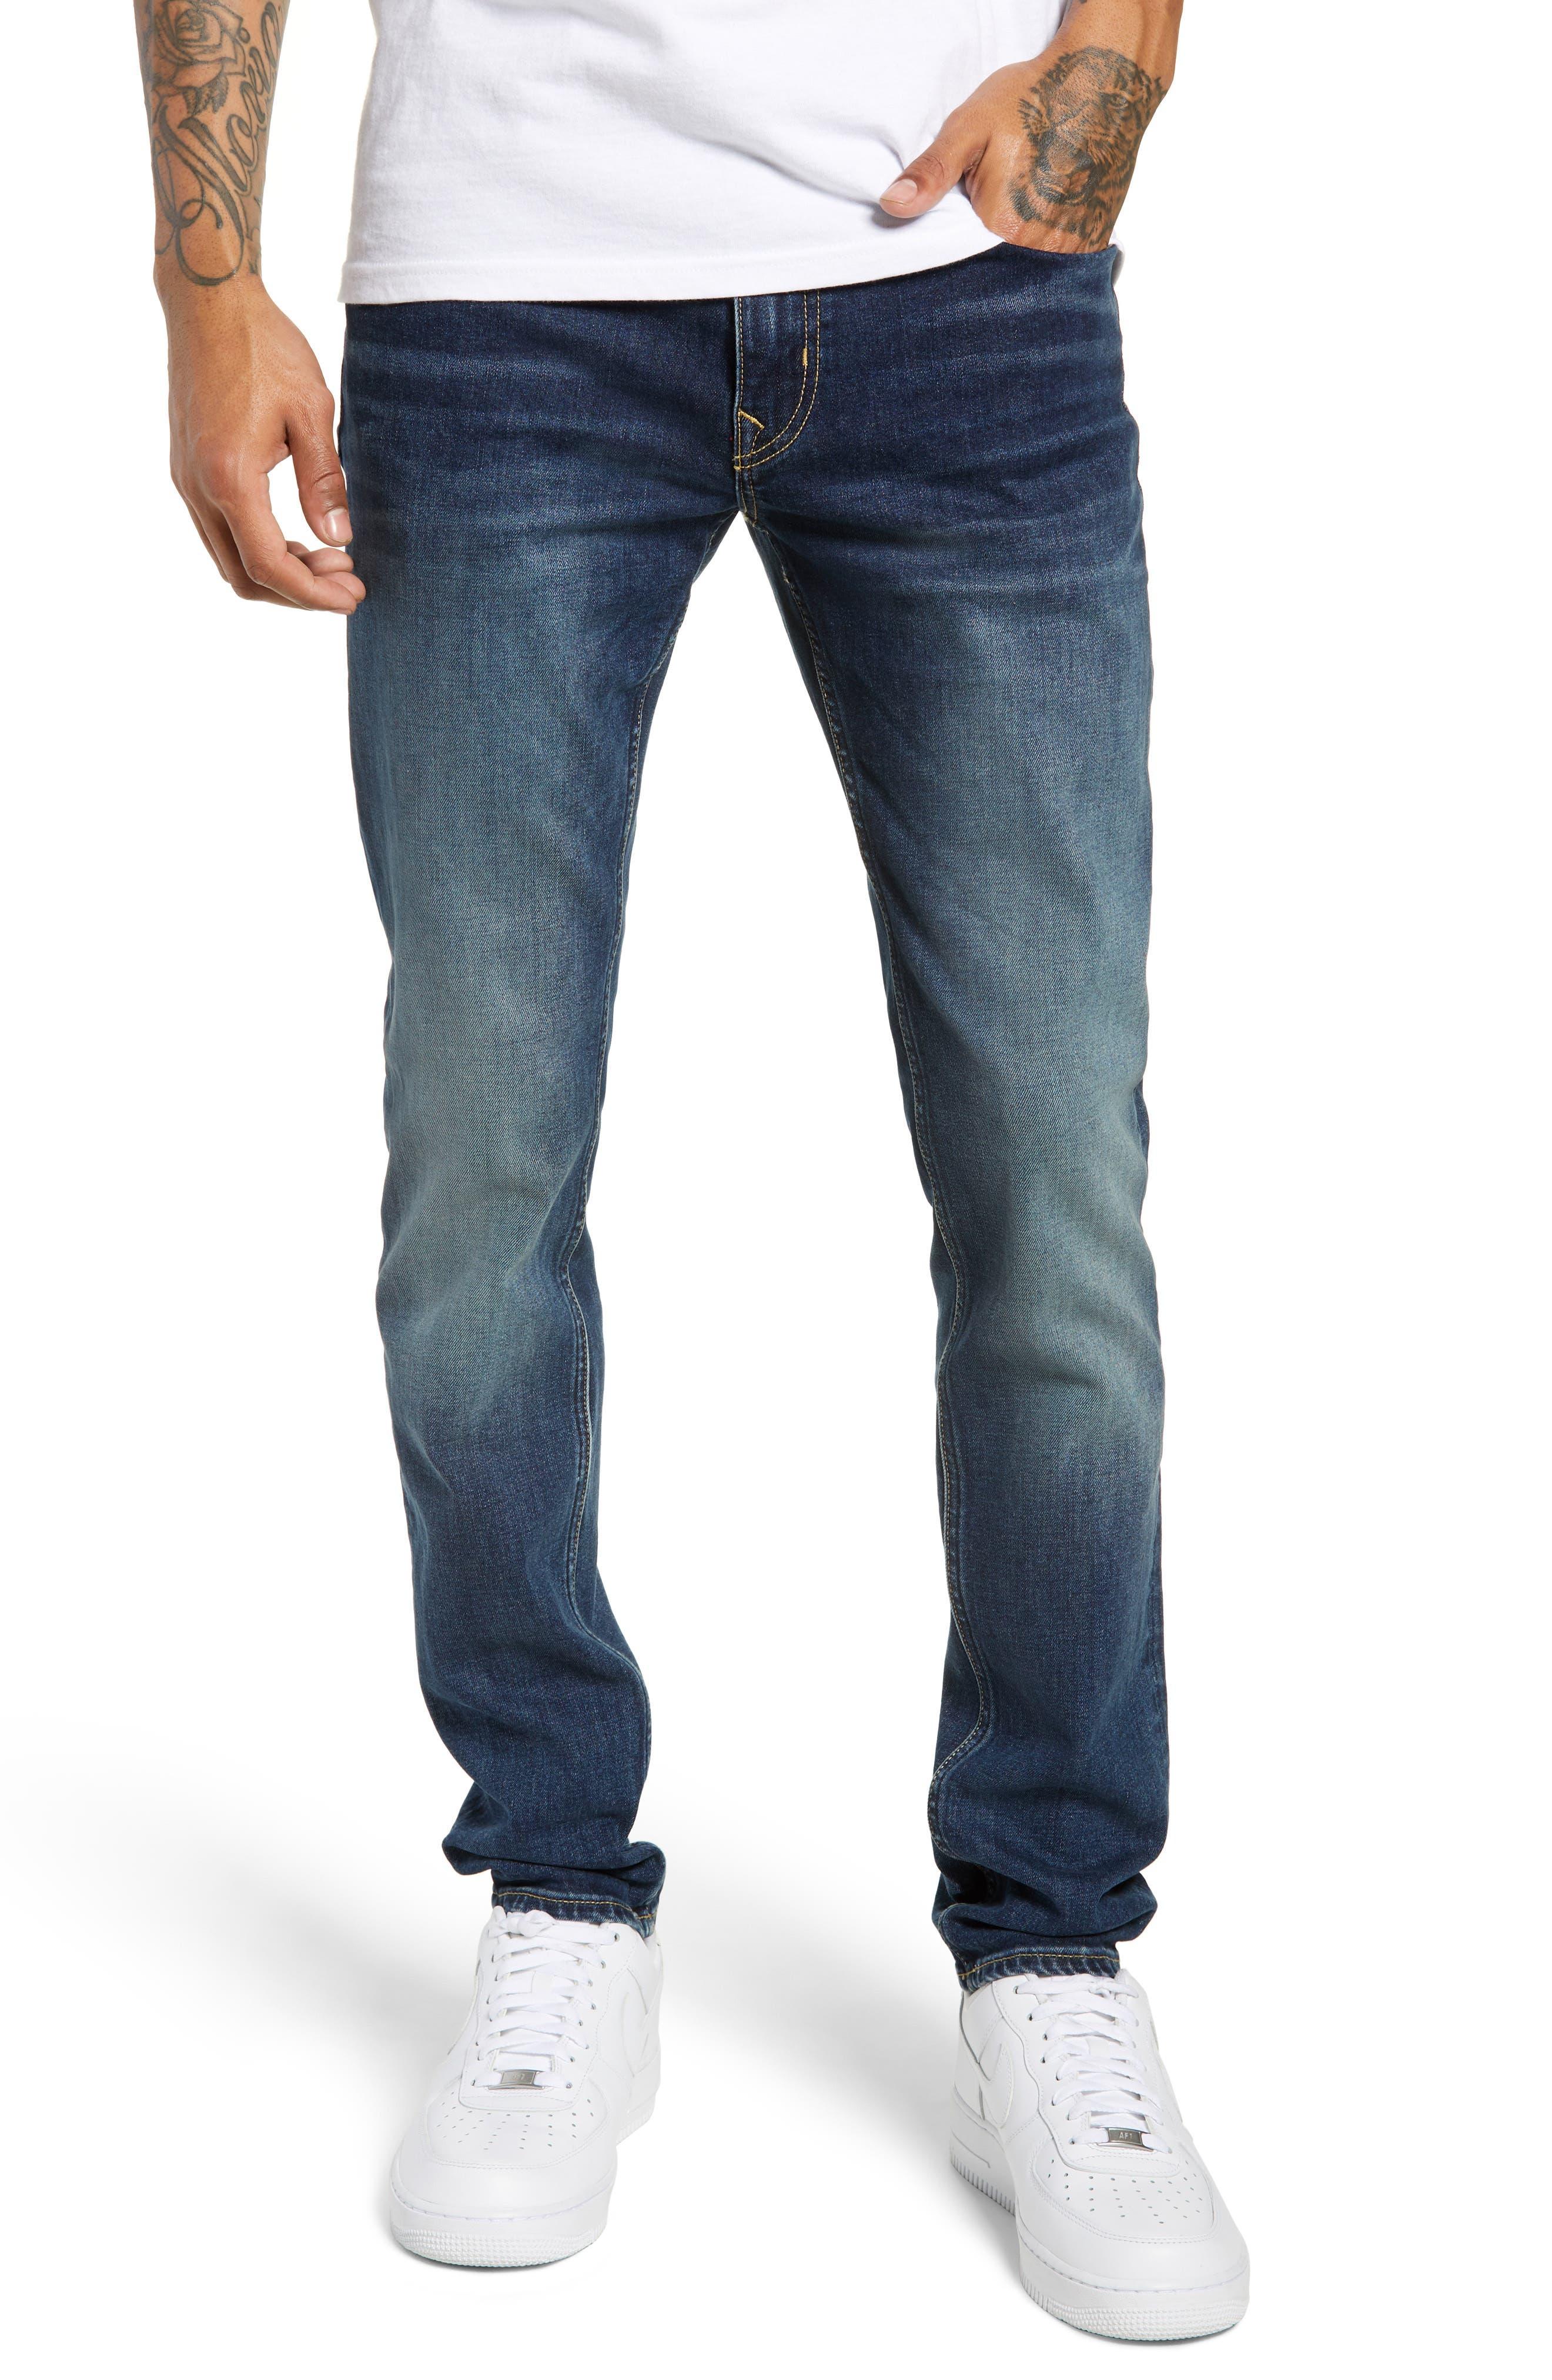 Keith Skinny Fit Jeans by Vigoss